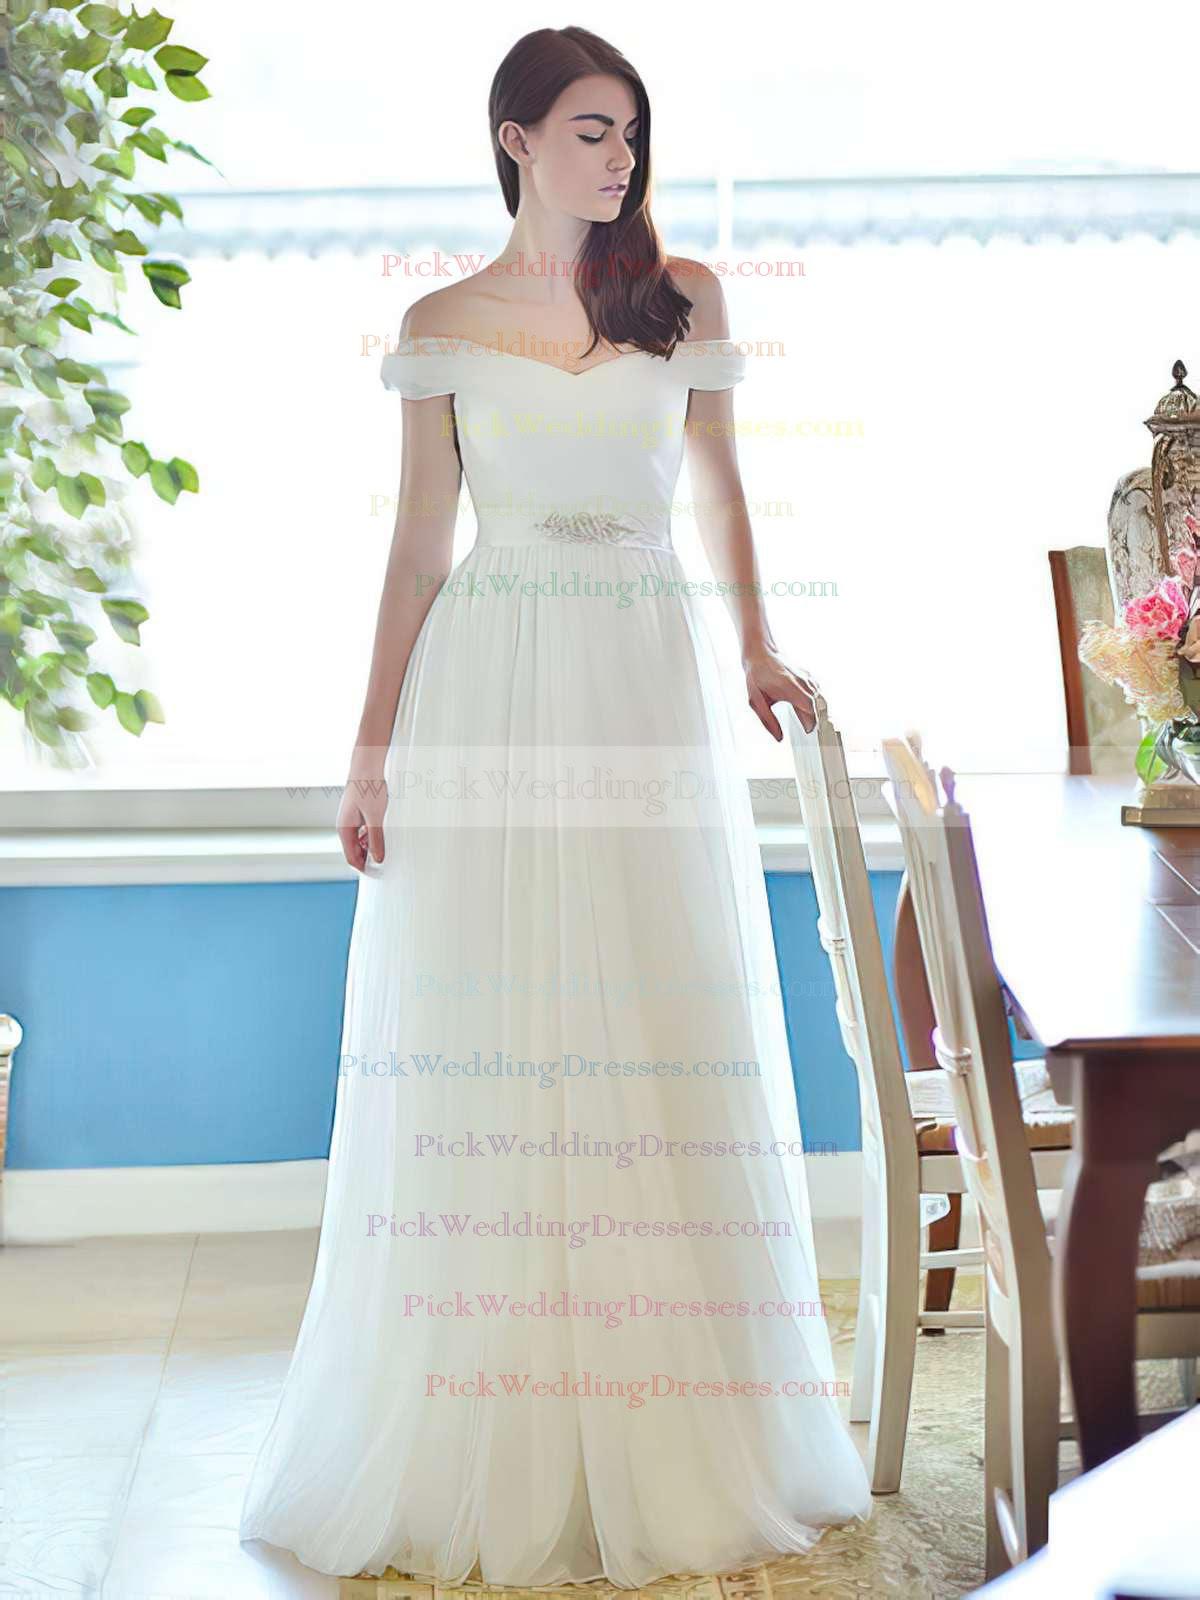 http://www.pickweddingdresses.com/ivory-tulle-straps-with-sashes-ribbons-elegant-off-the-shoulder-wedding-dress-pwd00021284-p1160.html?utm_source=post&utm_medium=PWD007&utm_campaign=blog